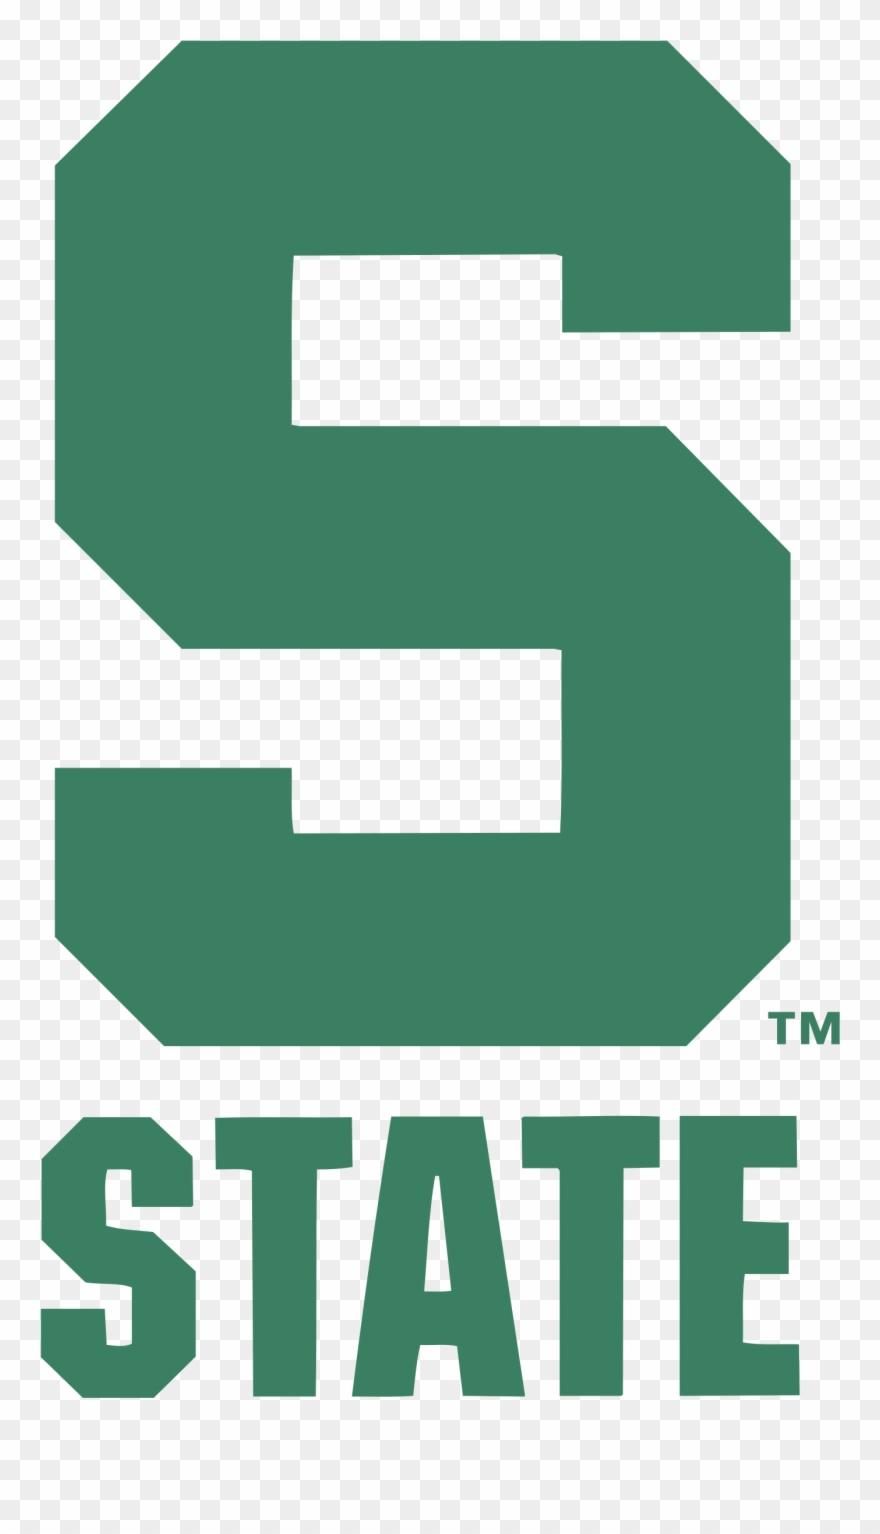 Michigan state spartans logo clipart jpg black and white download Michigan State Spartans Logo Png Transparent - Michigan ... jpg black and white download